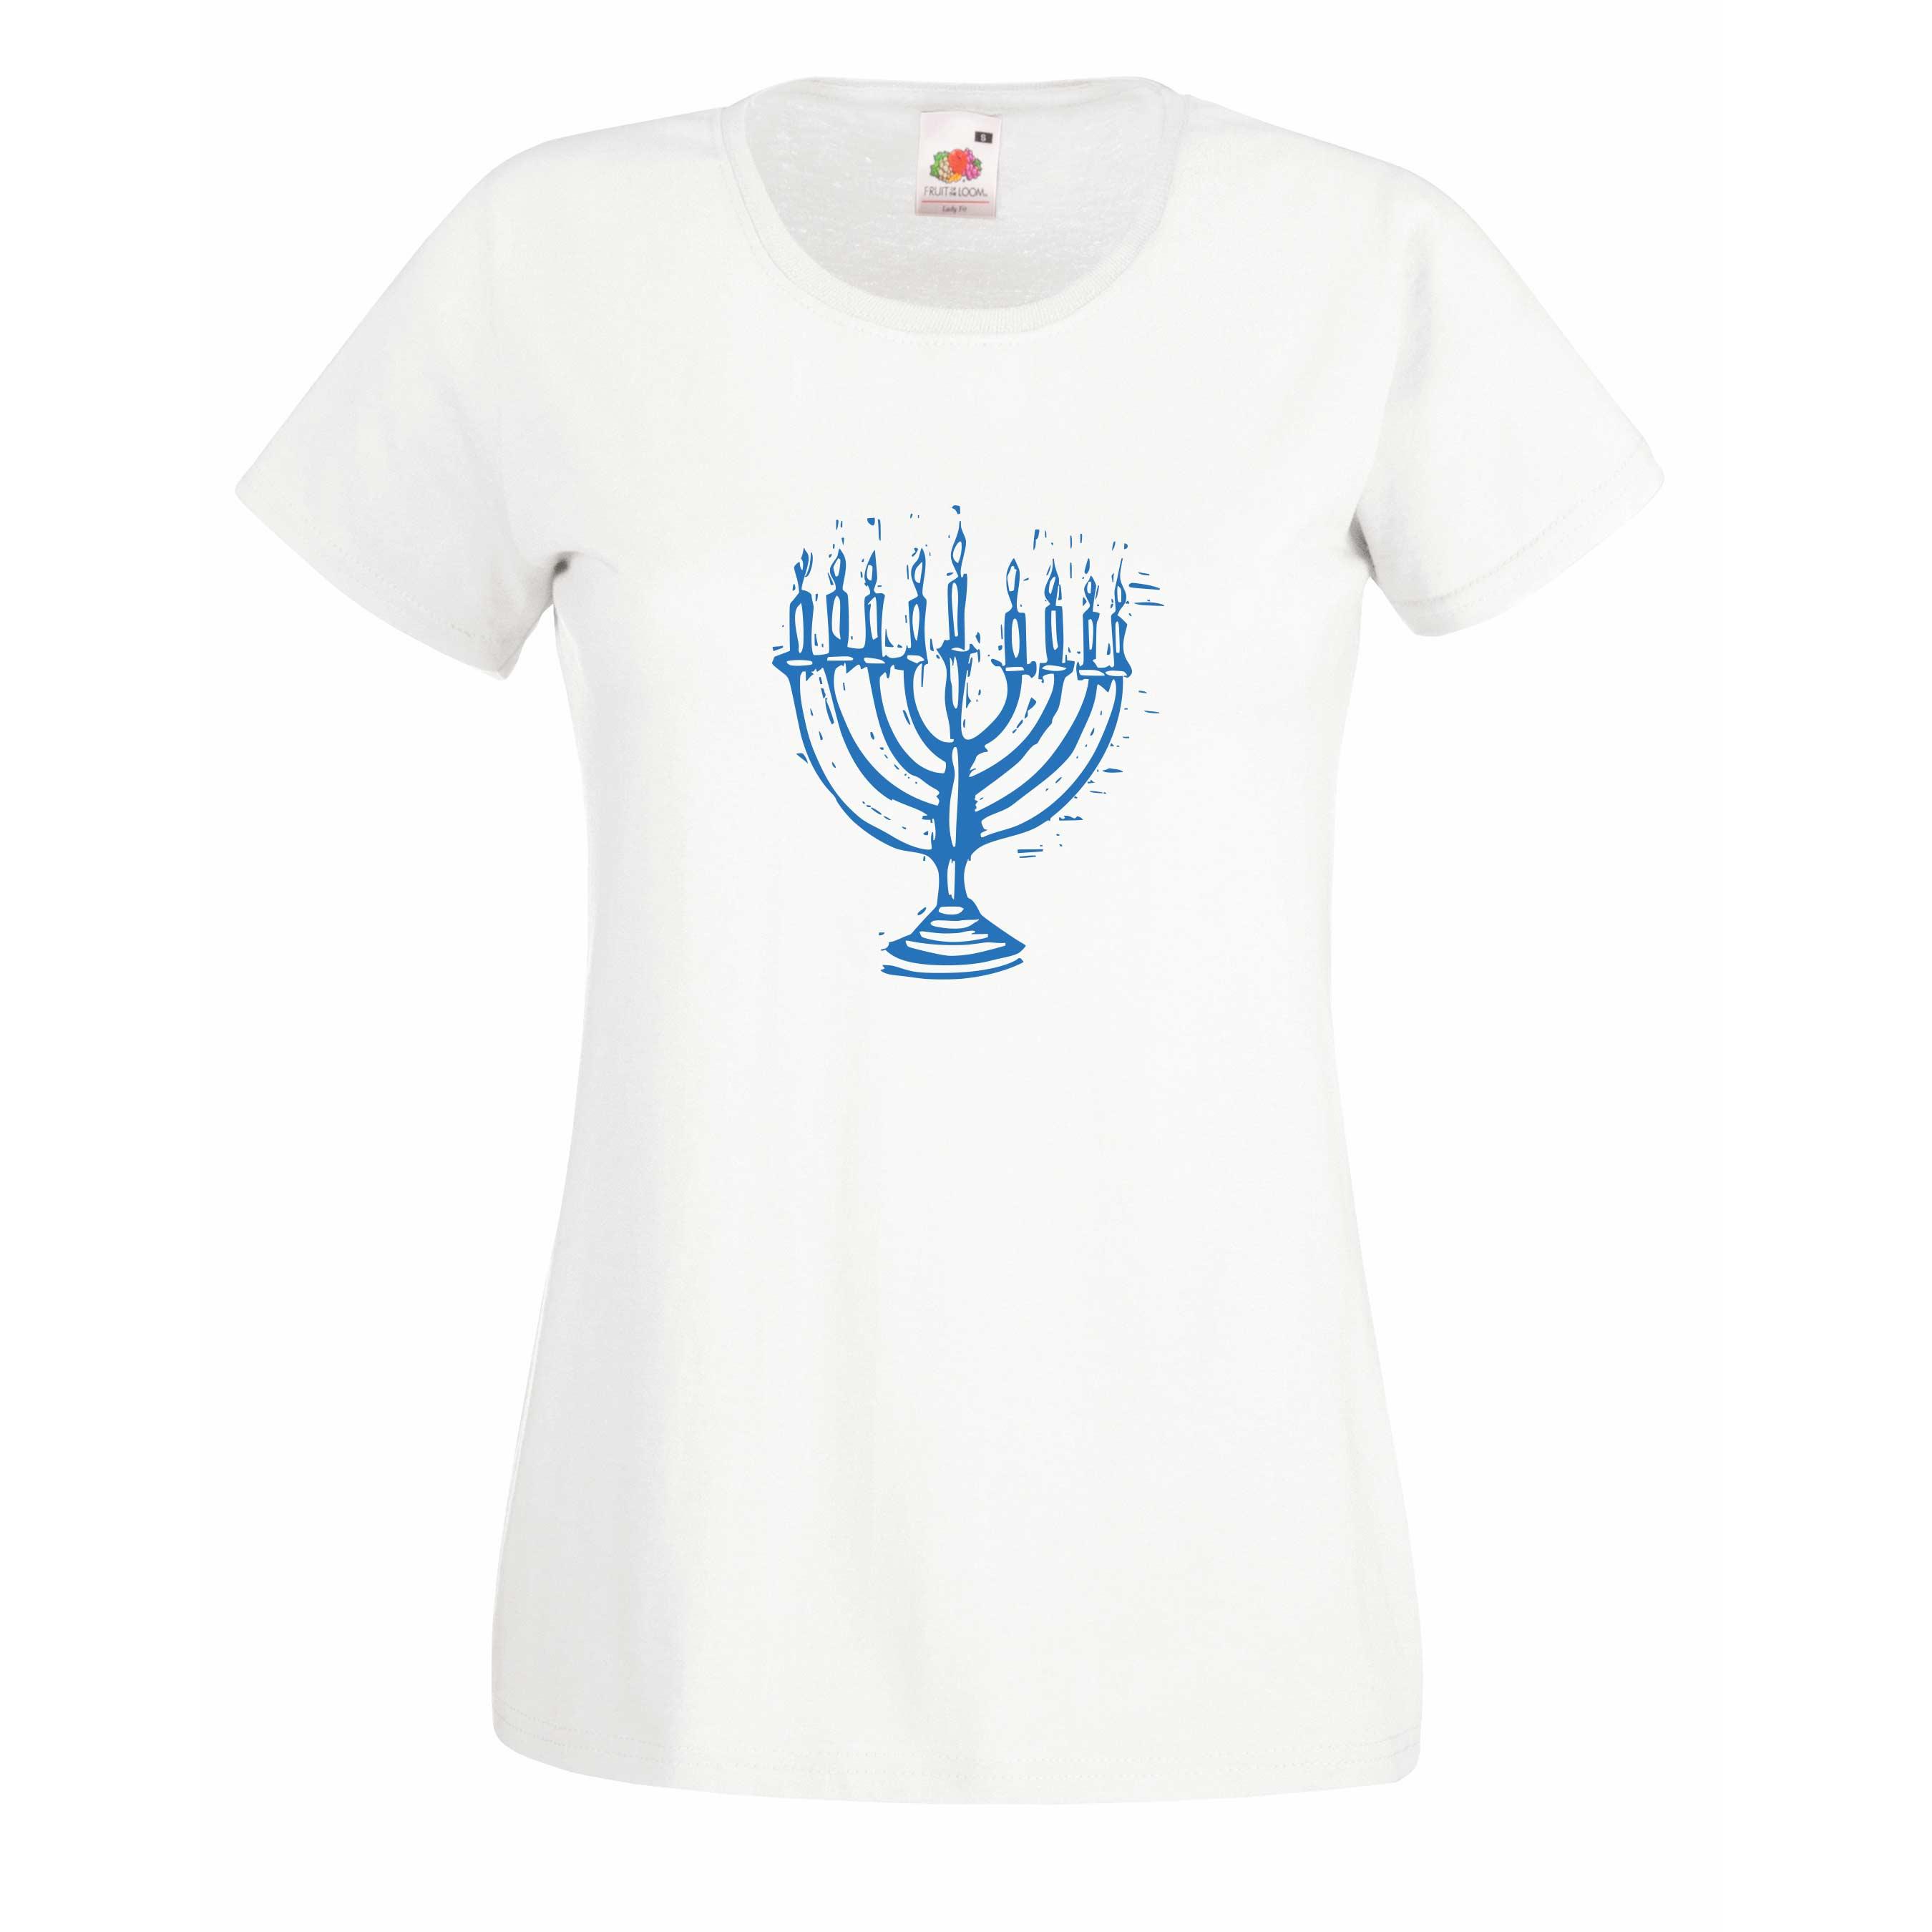 Menorah design for t-shirt, hoodie & sweatshirt